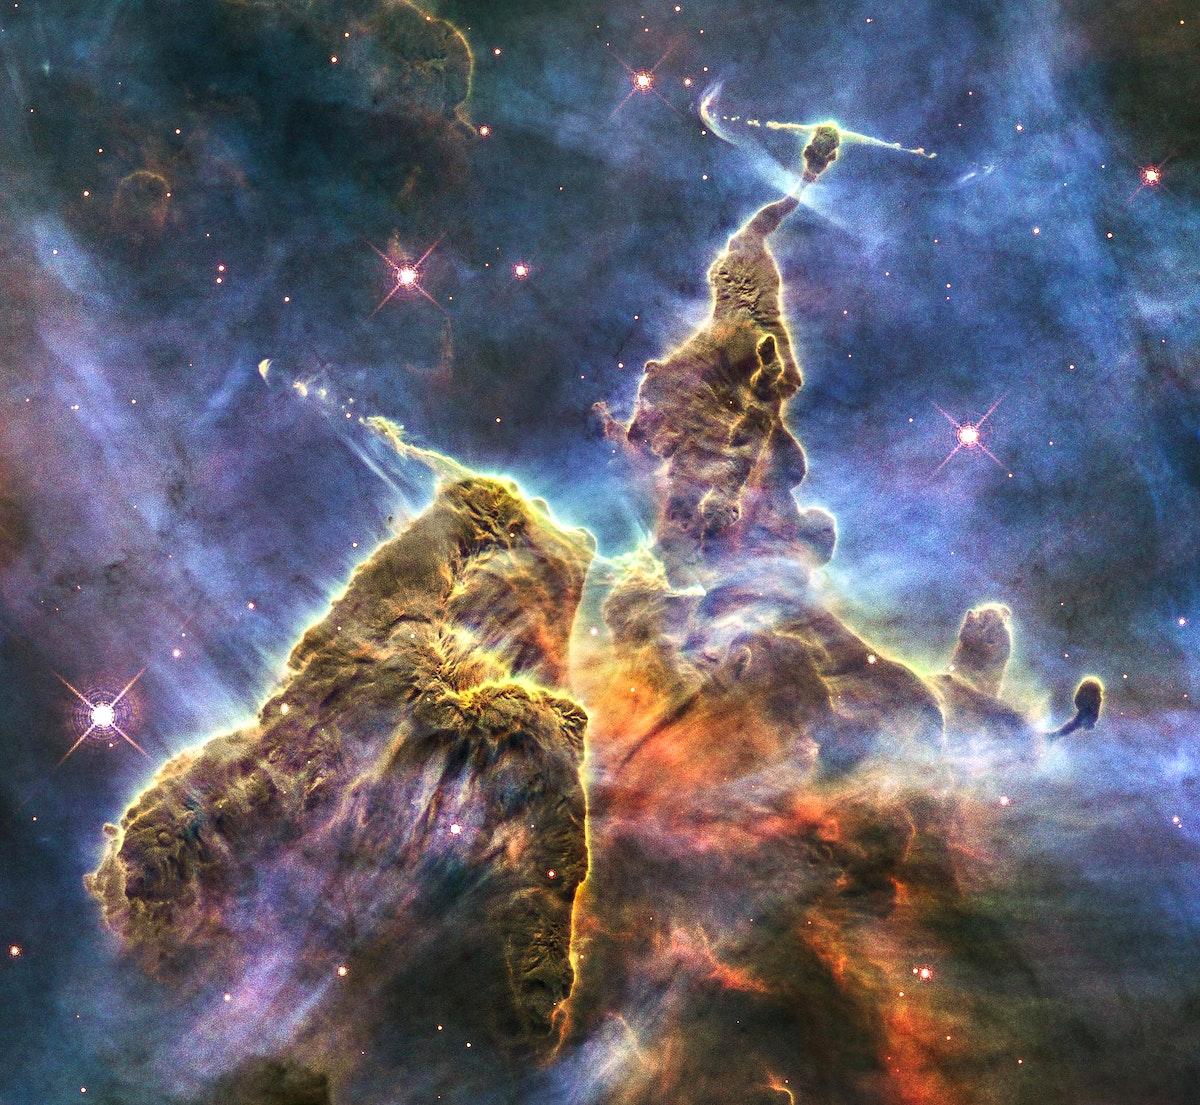 Image of a nebula taken using a NASA telescope. Original from NASA. Digitally enhanced by rawpixel.